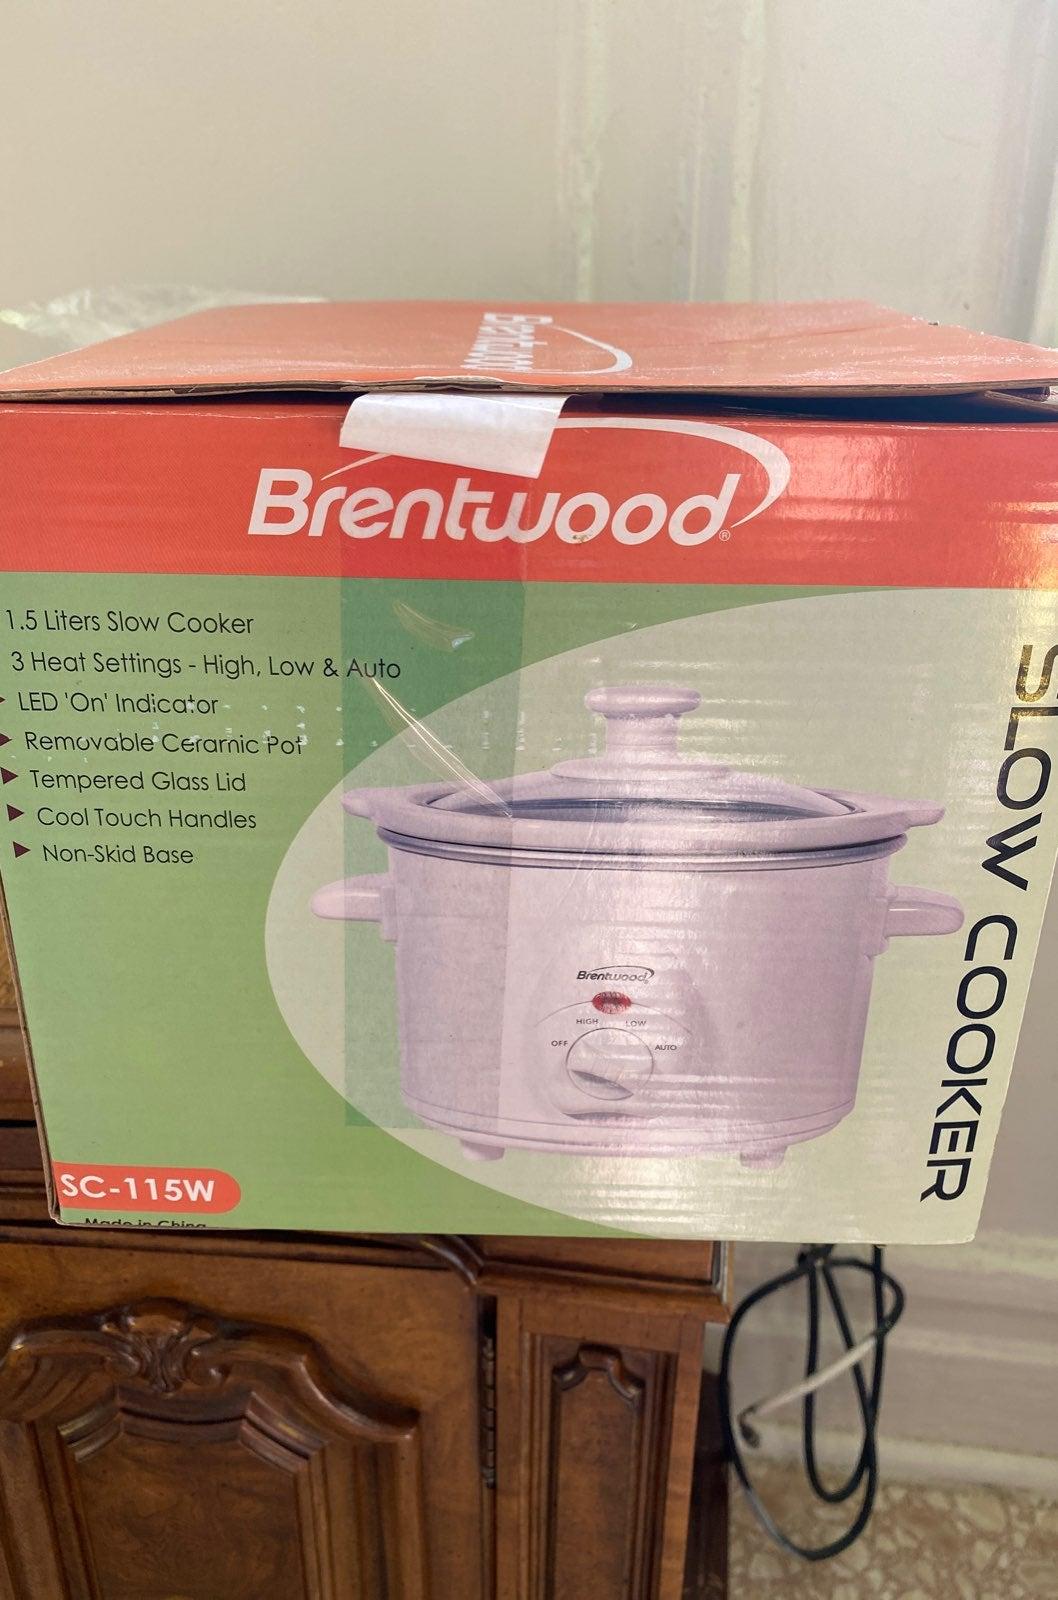 Brentwood 1.5 liter slow cooker